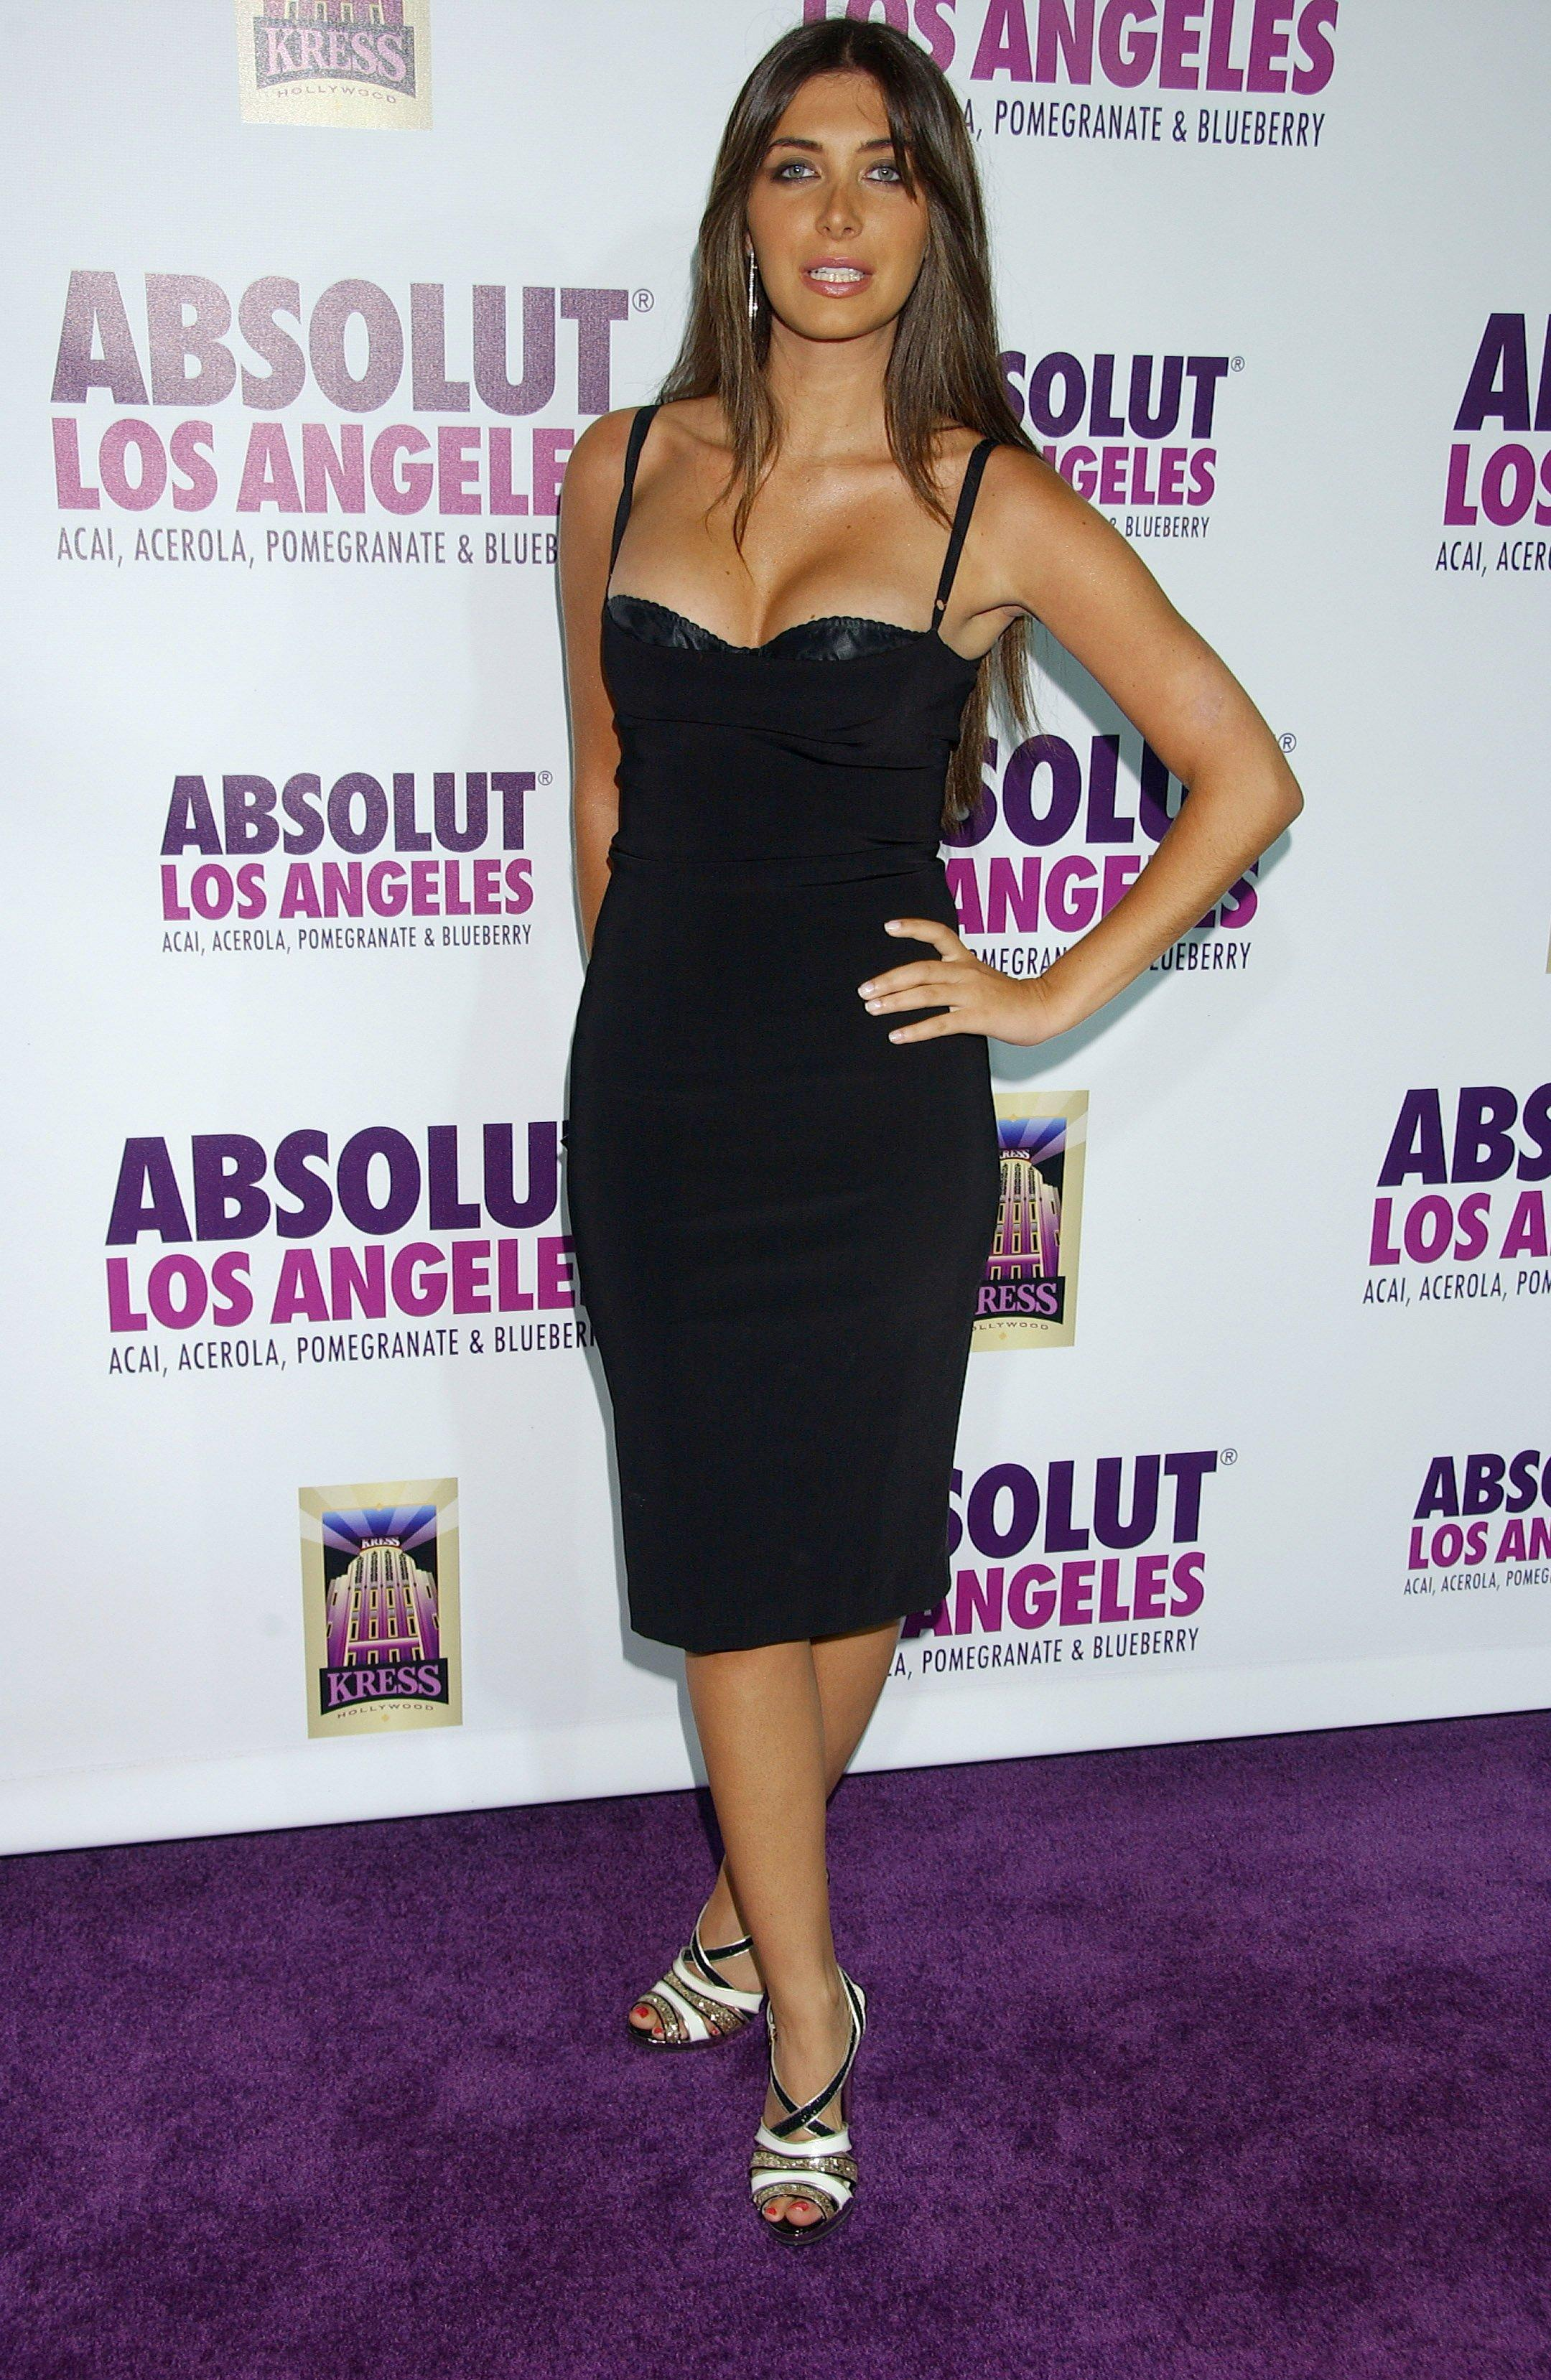 23193_Brittny_Gastineau_1_Absolut_Los_Angeles_world_premiere_at_the_Kress_club_6388_122_1058lo.jpg